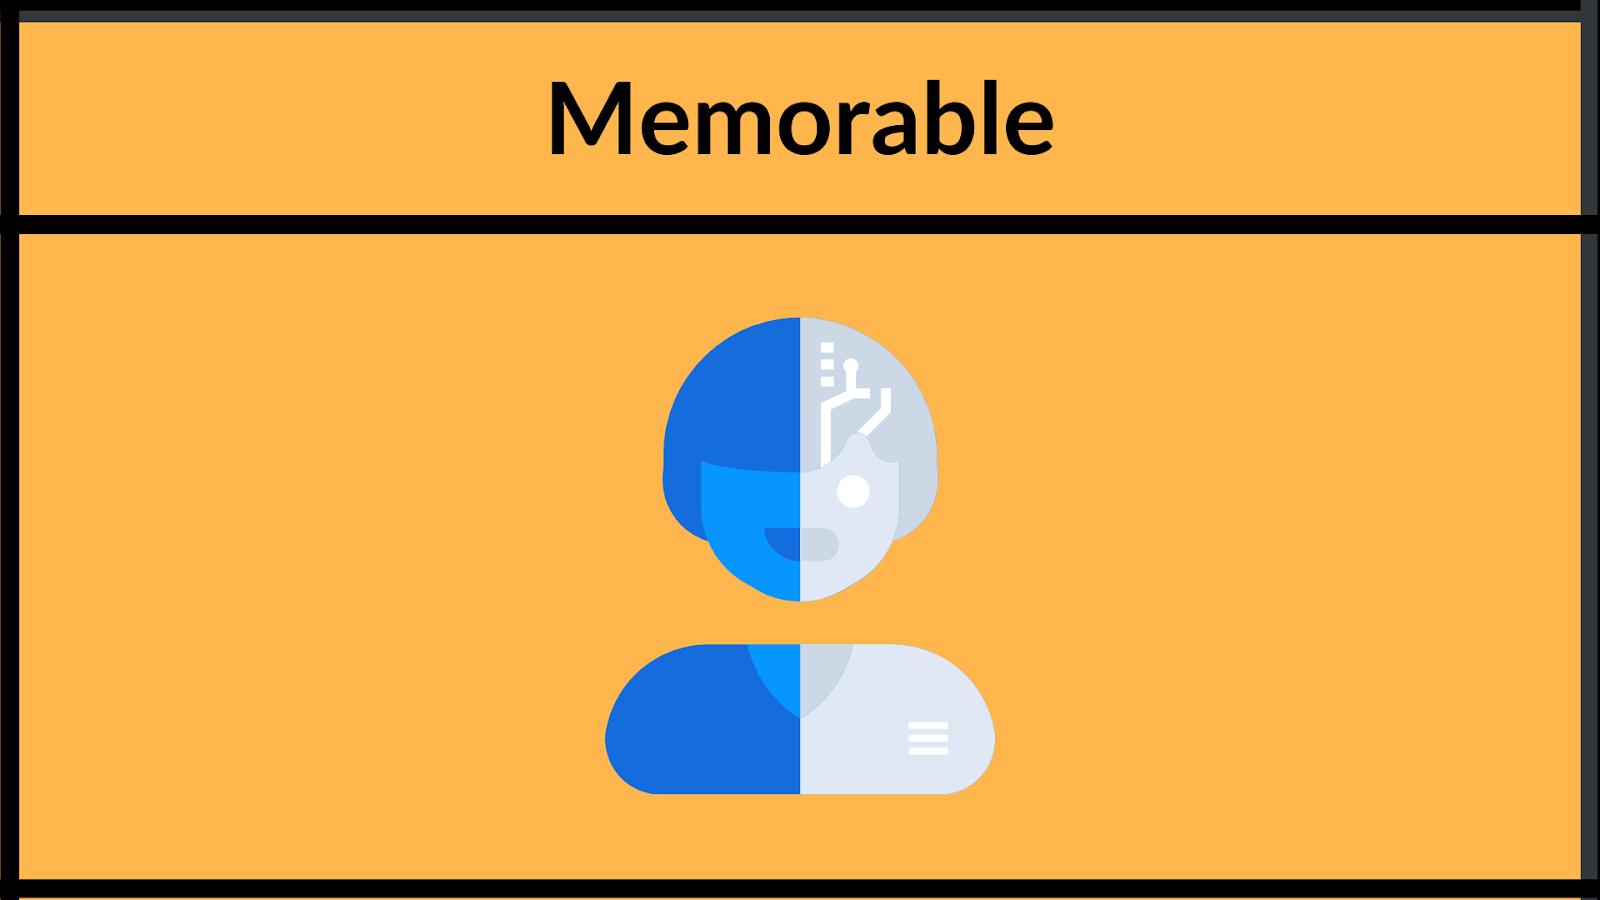 Neuromarketing stimuli; Memorable